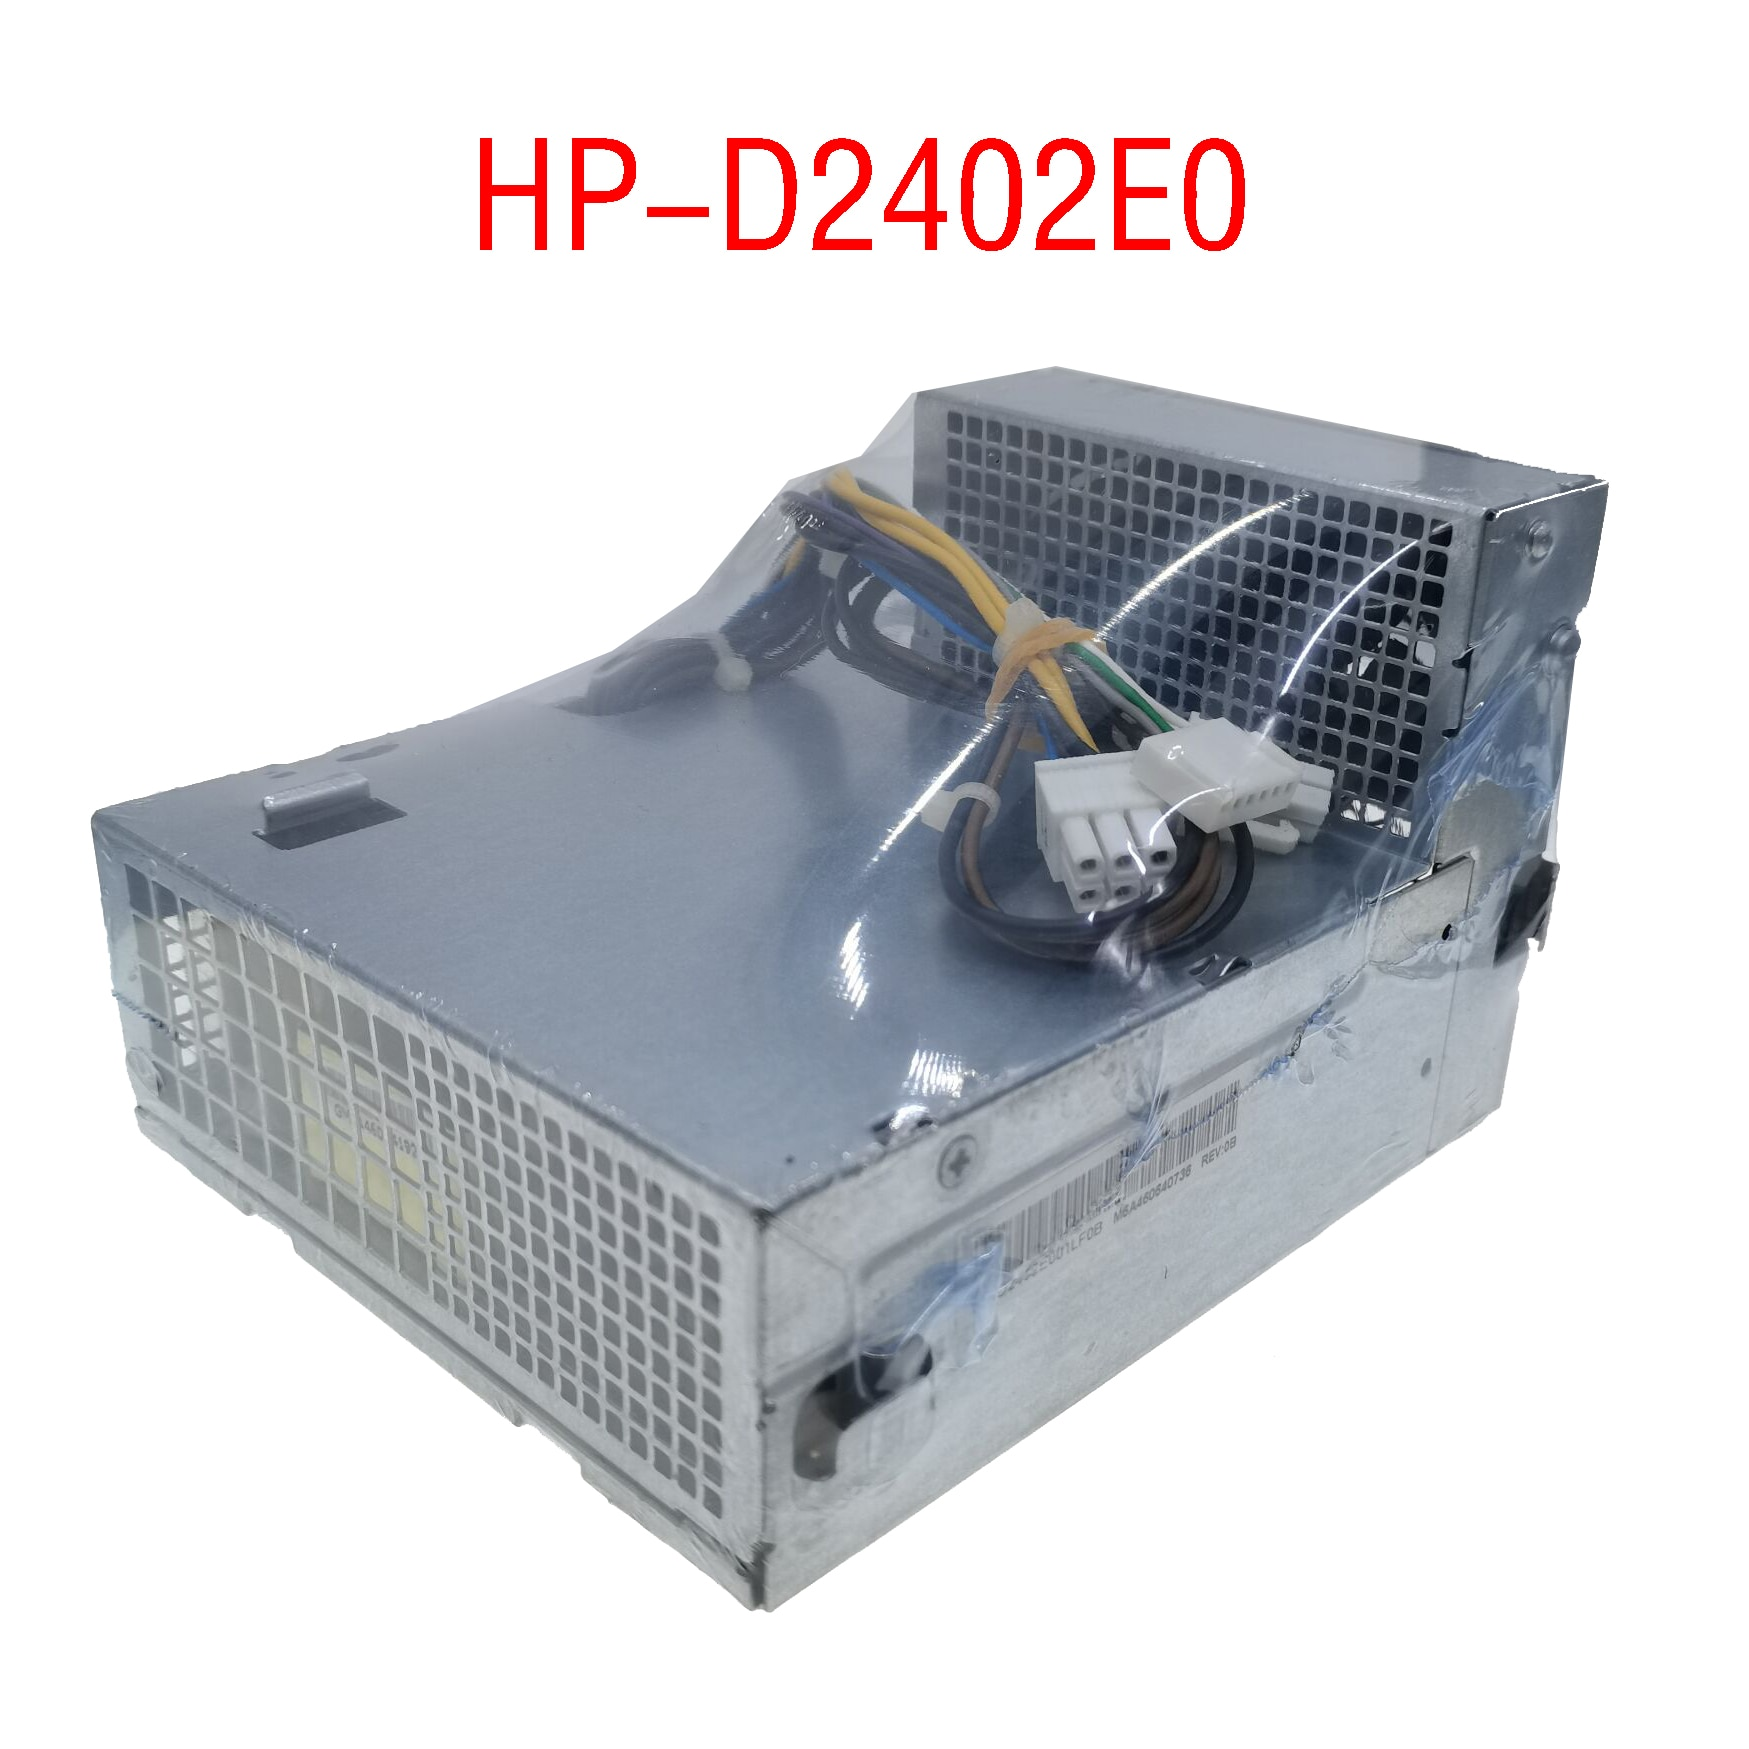 Netzteil netzteil für 6000 6005 6200 6300 8000 8100 8200 240W HP-D2402E0 / AO PS-4241-9HA / HB / HF PC9058 PC8027 PC8019 PC90